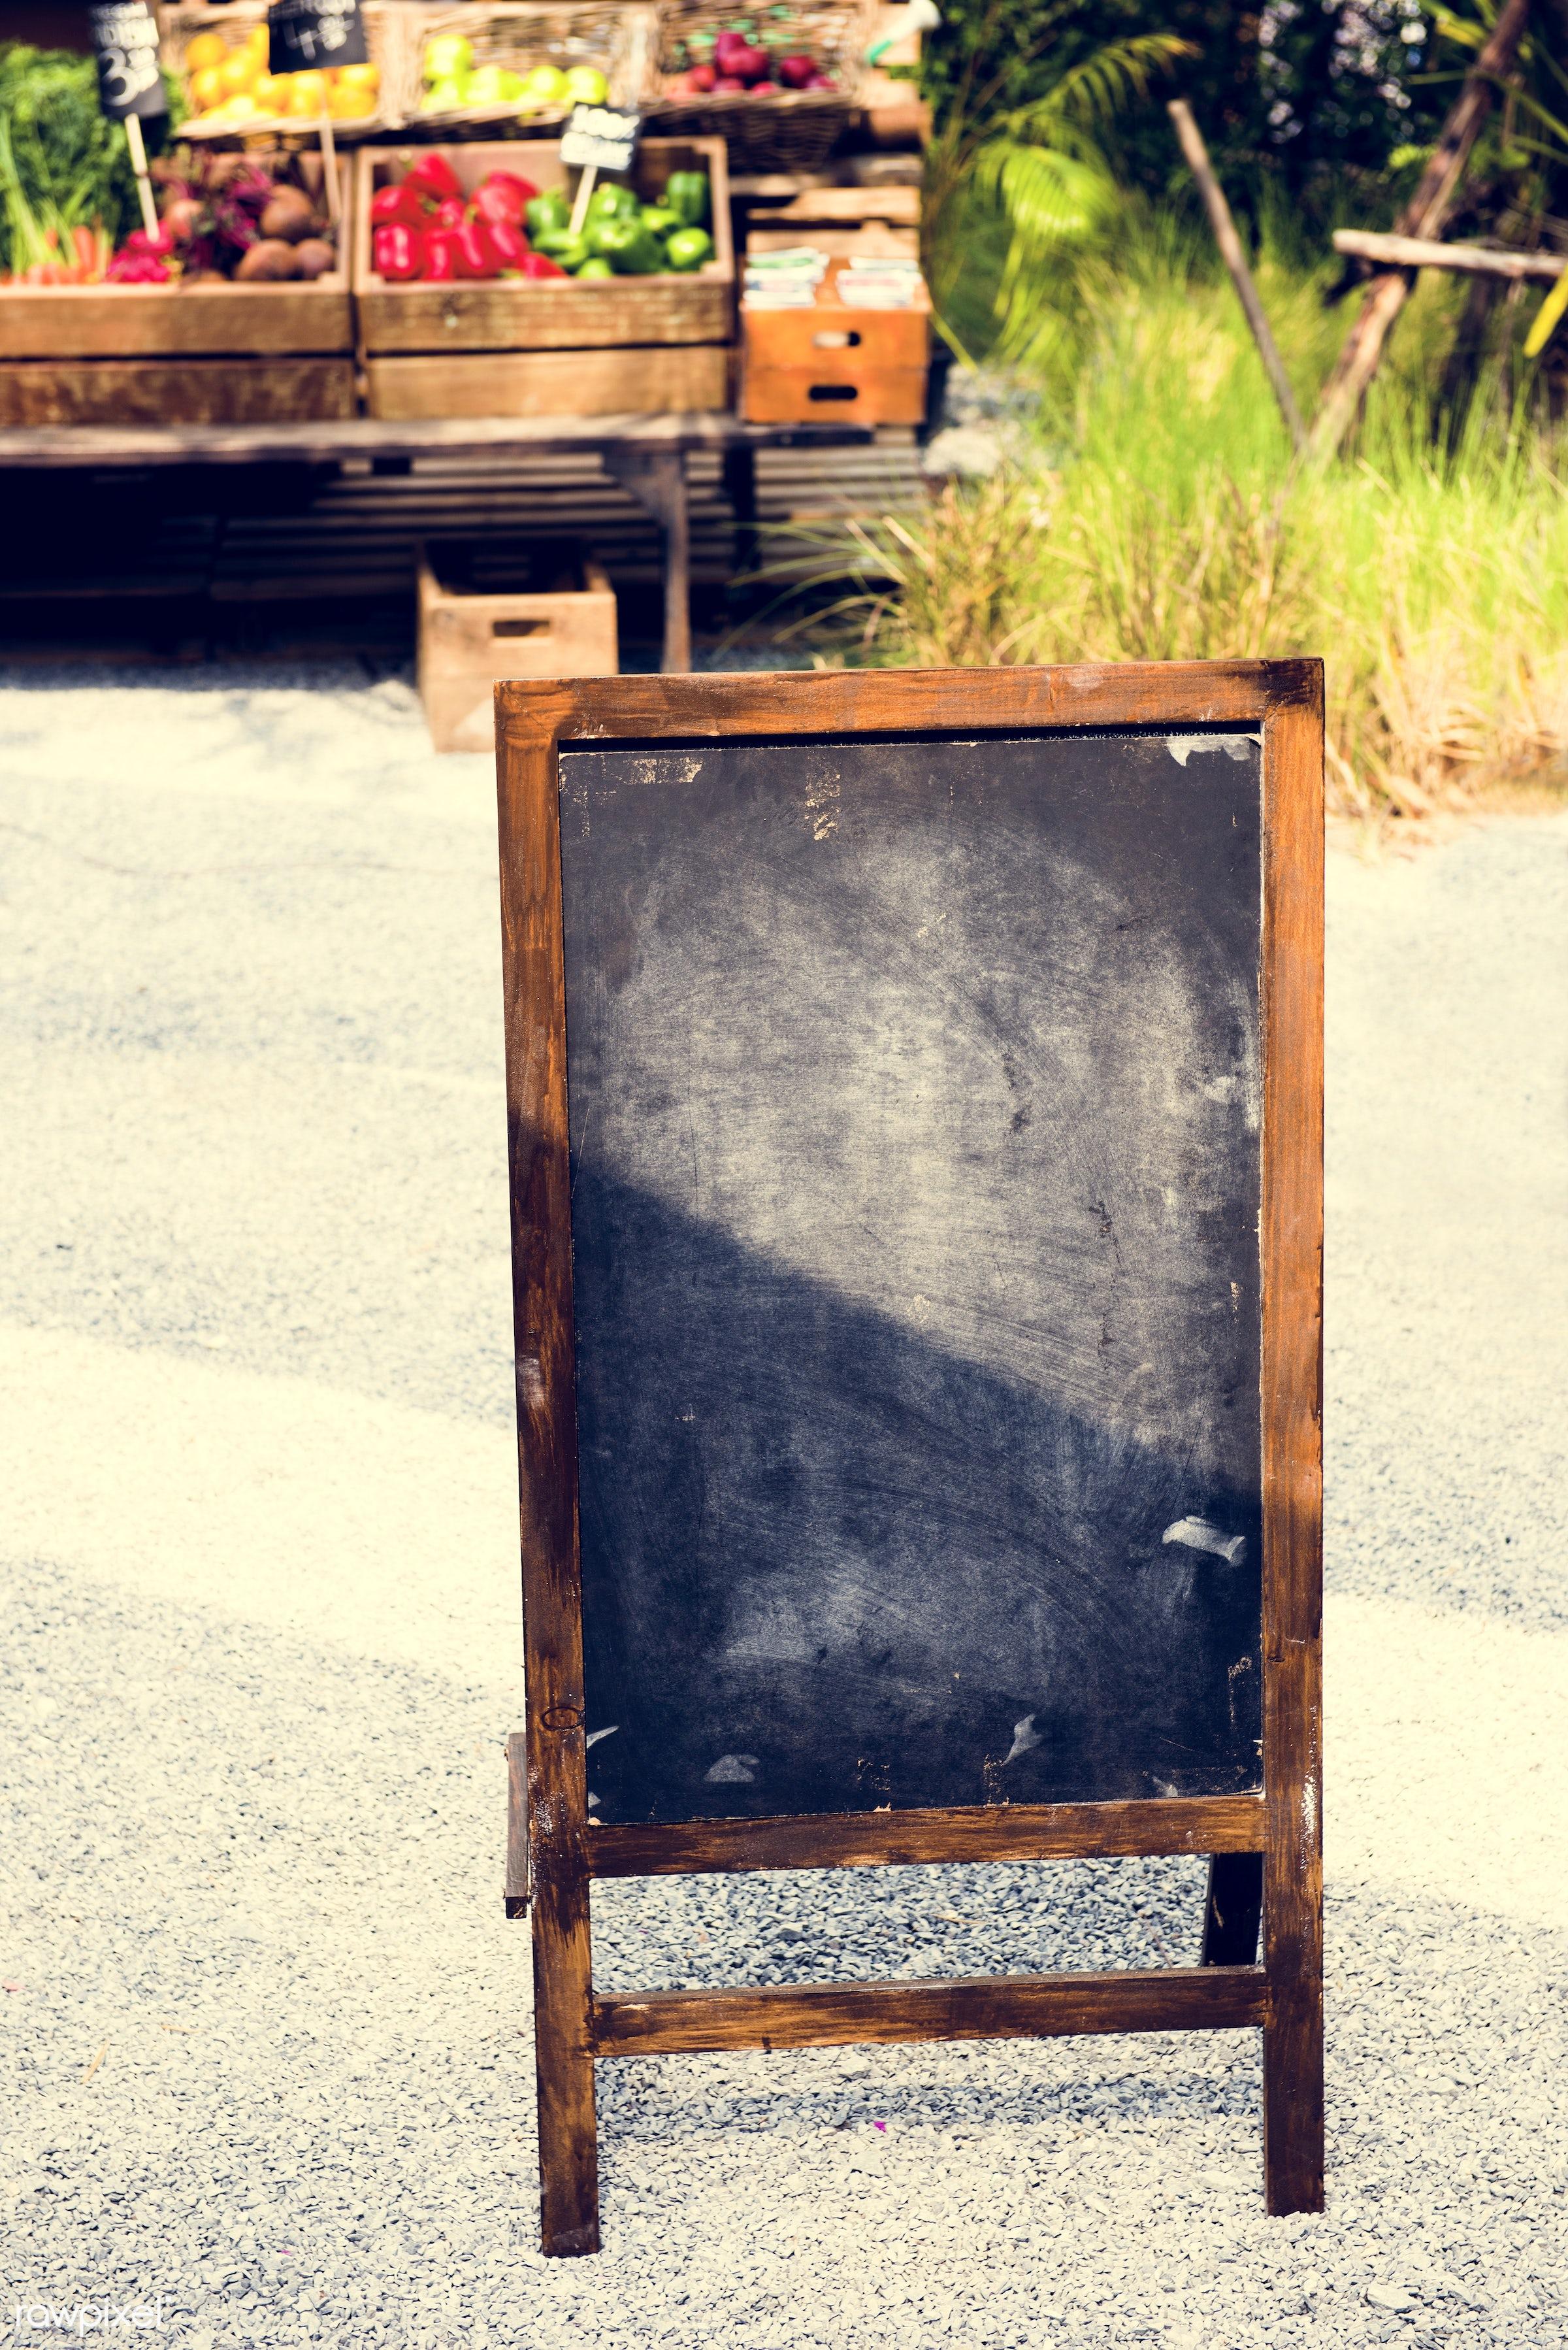 copy space, chalkboard, show, consumer, farm, placard, farmer, sell, fresh, empty, products, wooden box, blank, selling,...